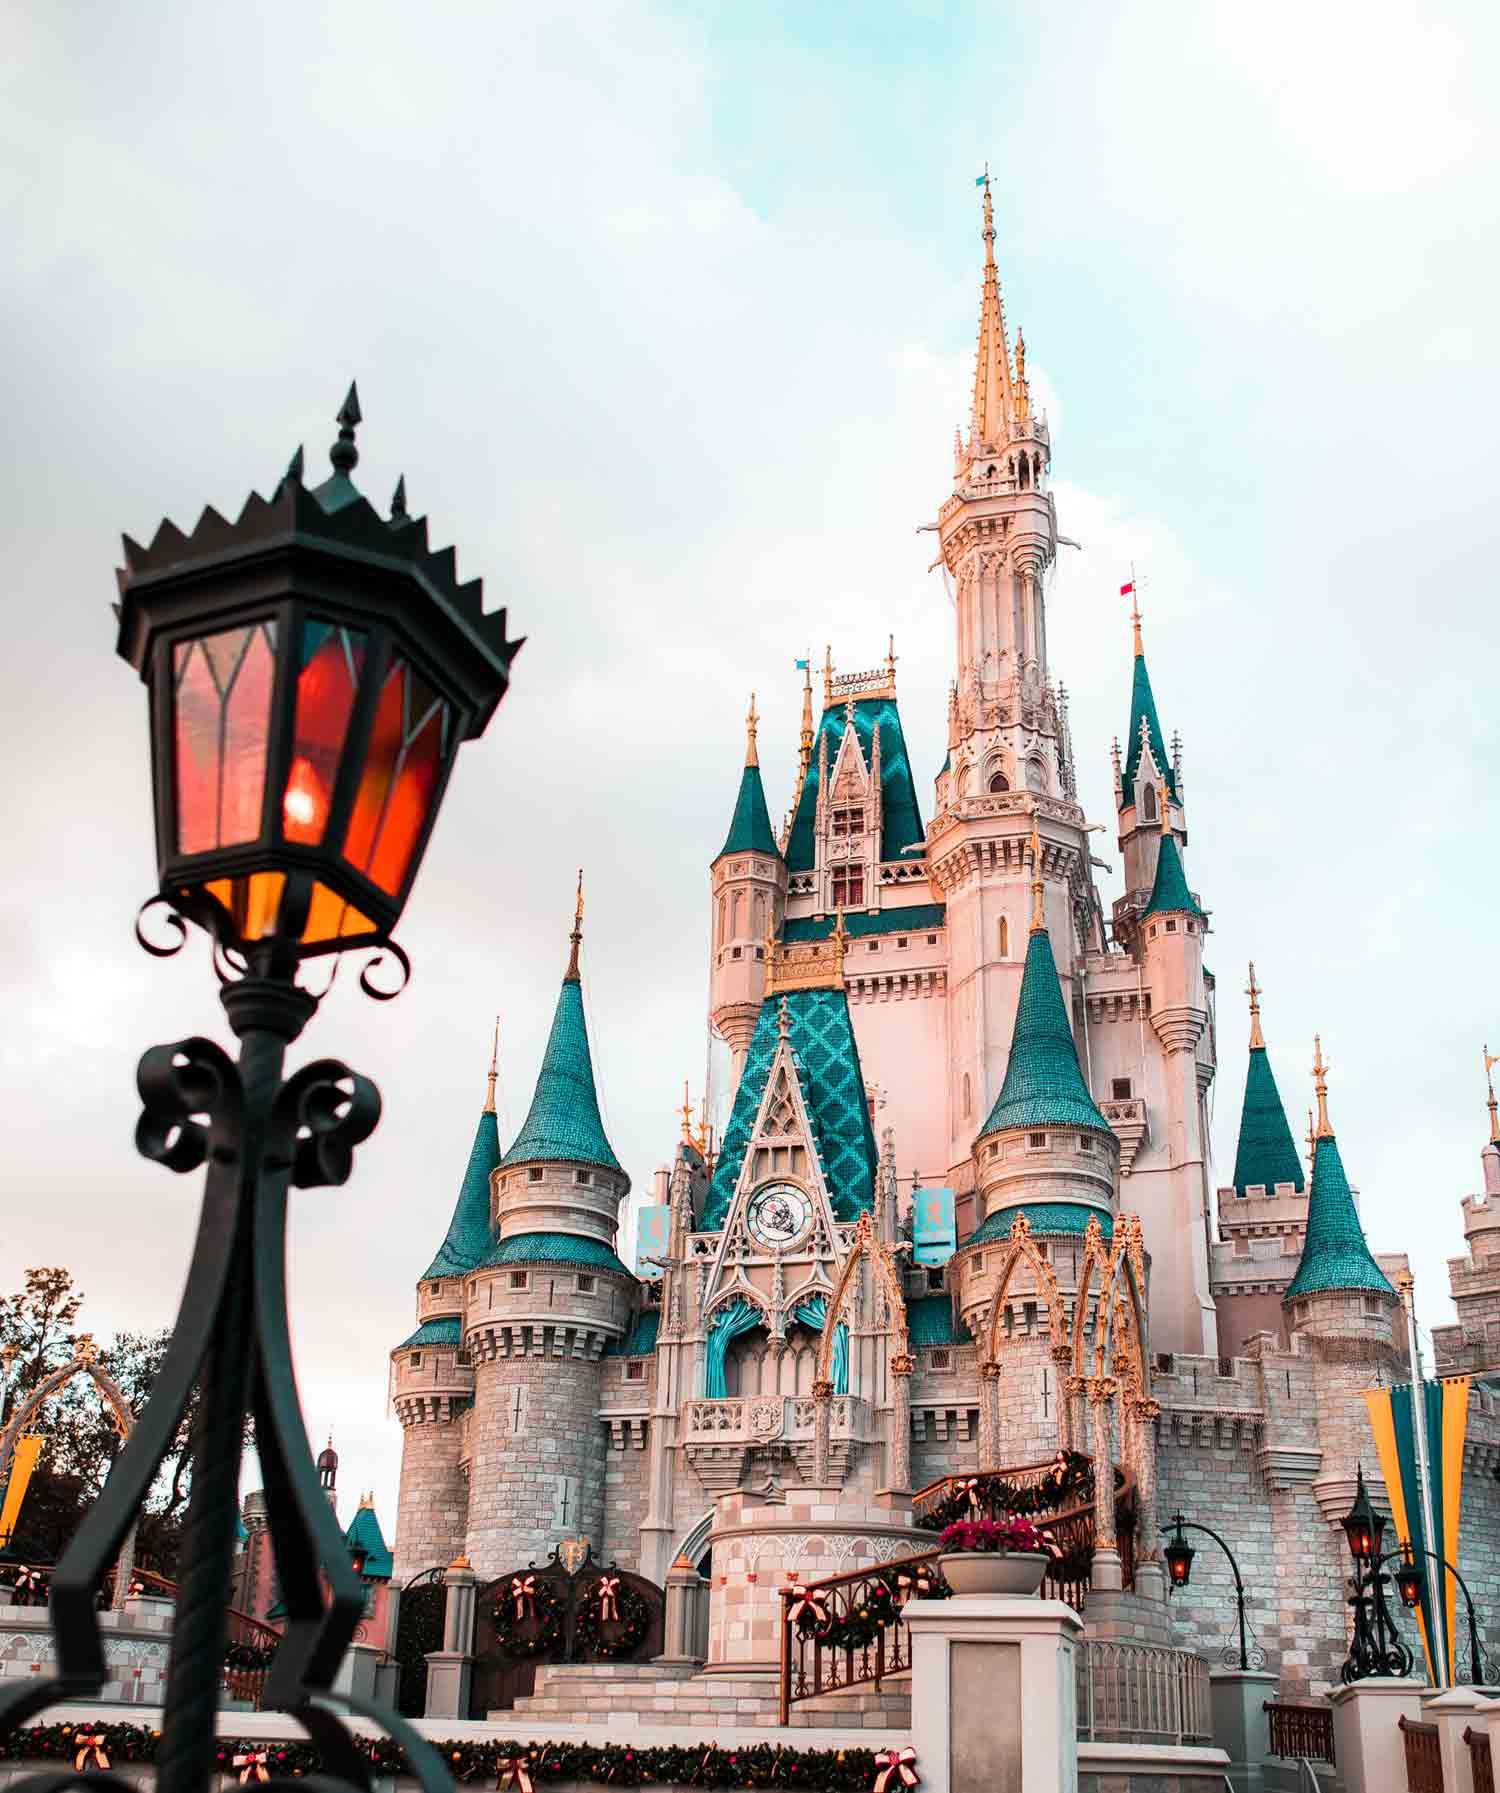 Disney-World-or-DisneyLand